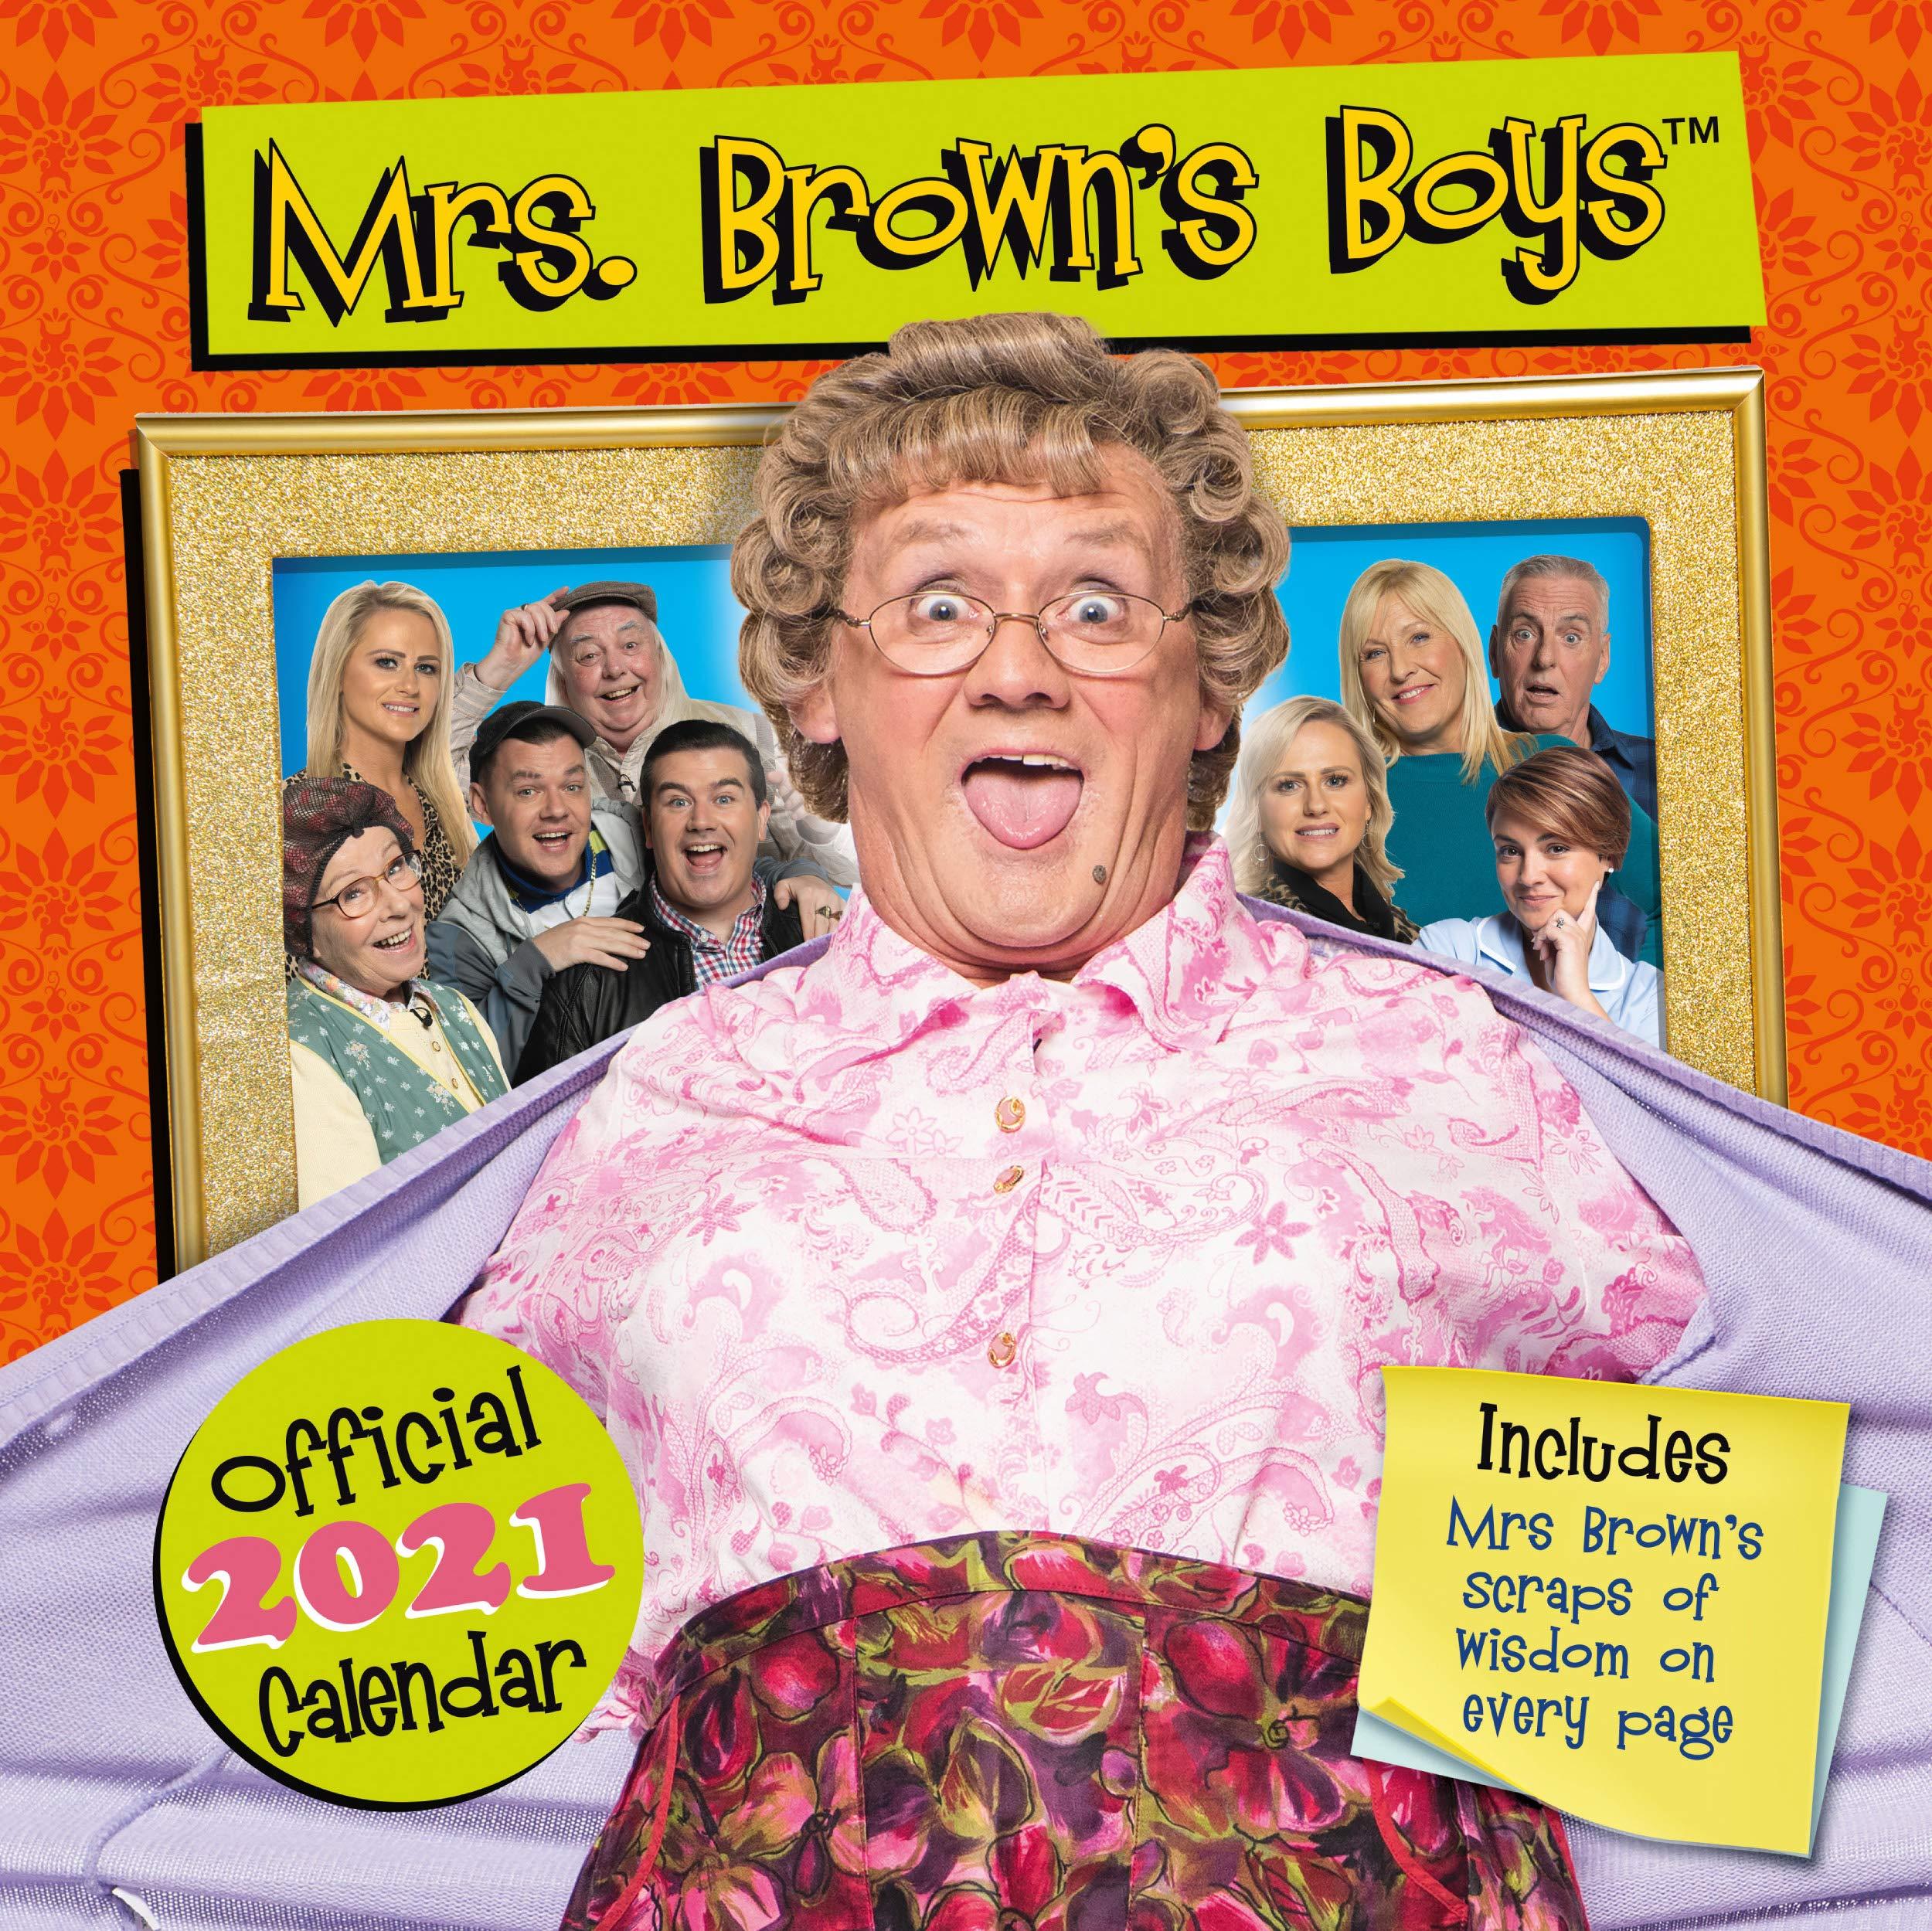 Mrs Browns Boys 2021 Christmas Special Official Mrs Brown S Boys 2021 Calendar Square Wall Format Calendar 9781838544447 Amazon Com Books